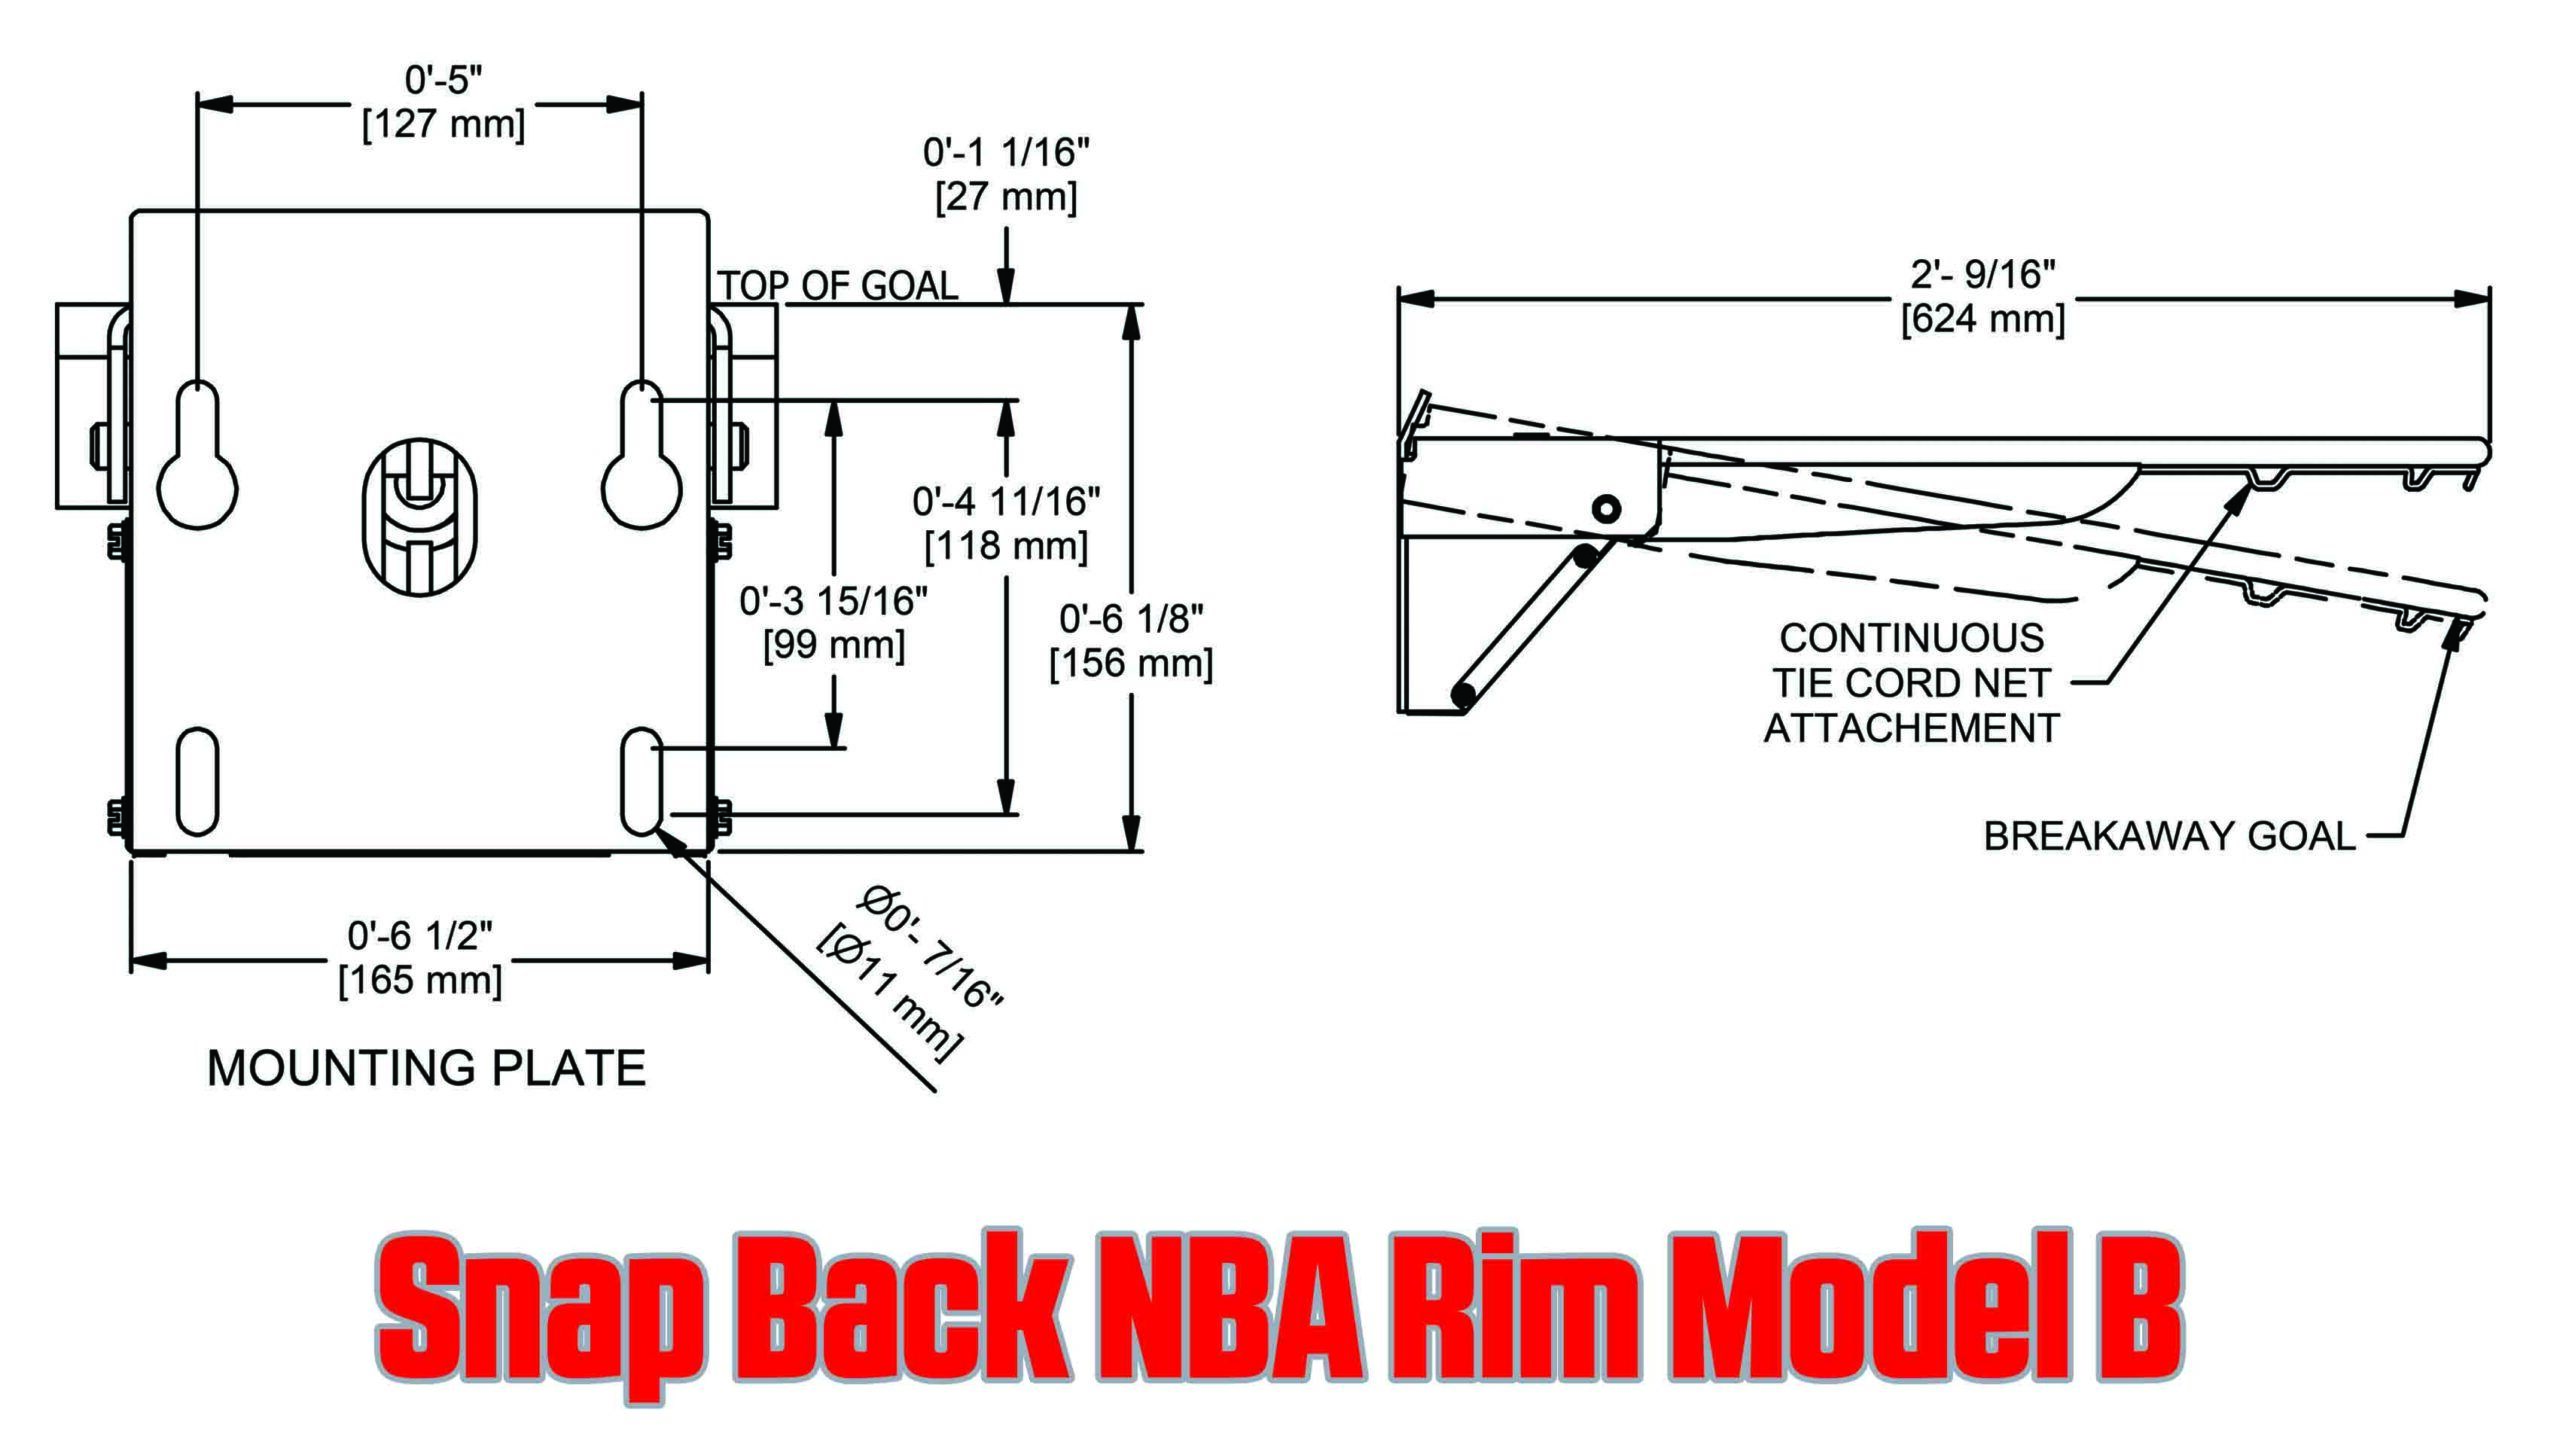 Snap Back NBA Basketball Rim Specs Model B